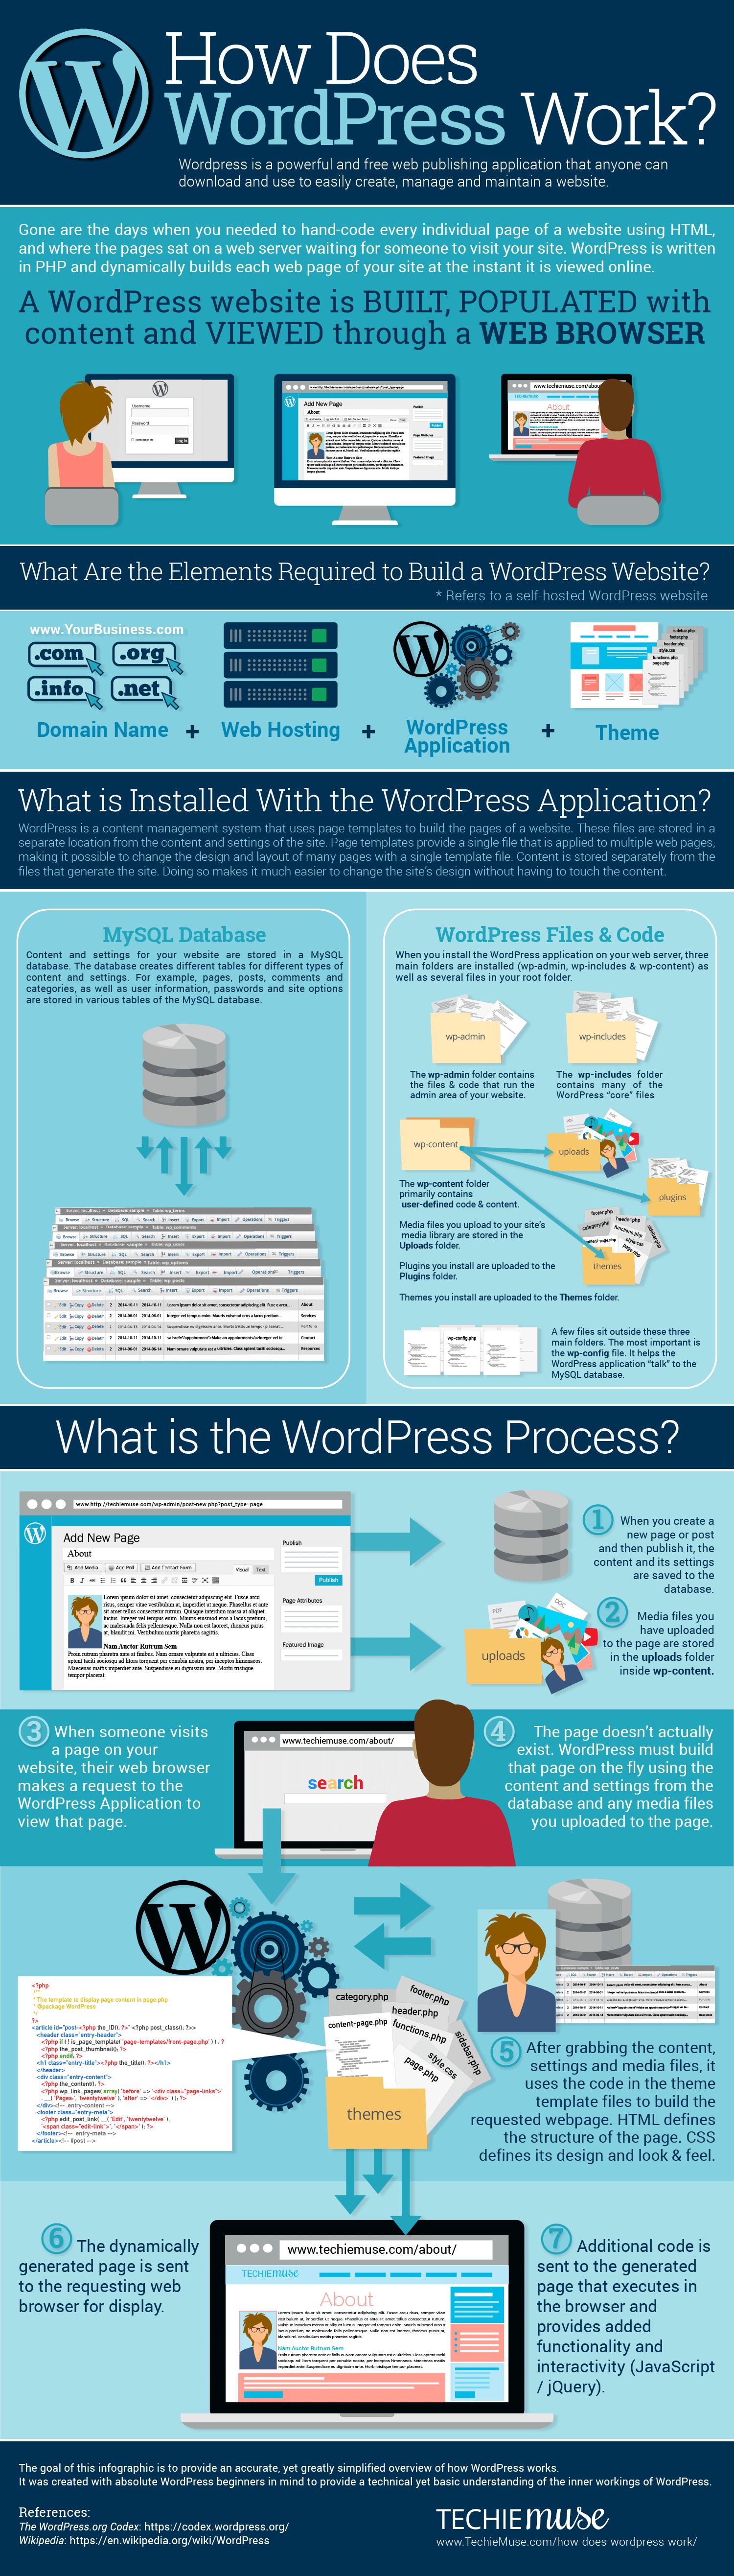 how does wordpress work